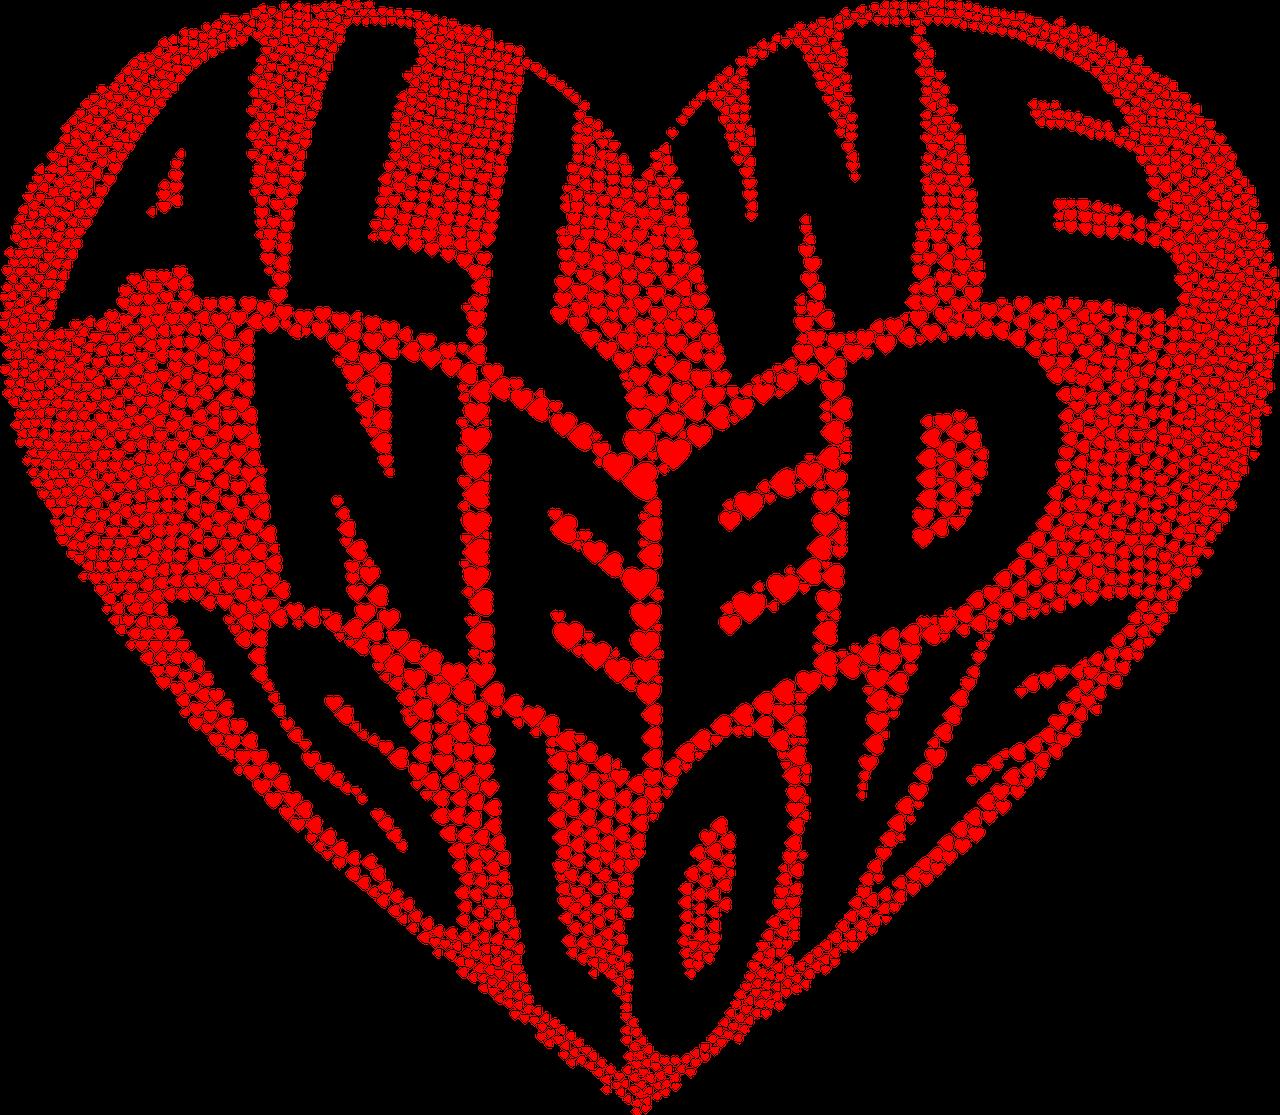 hearts-2789715_1280.png